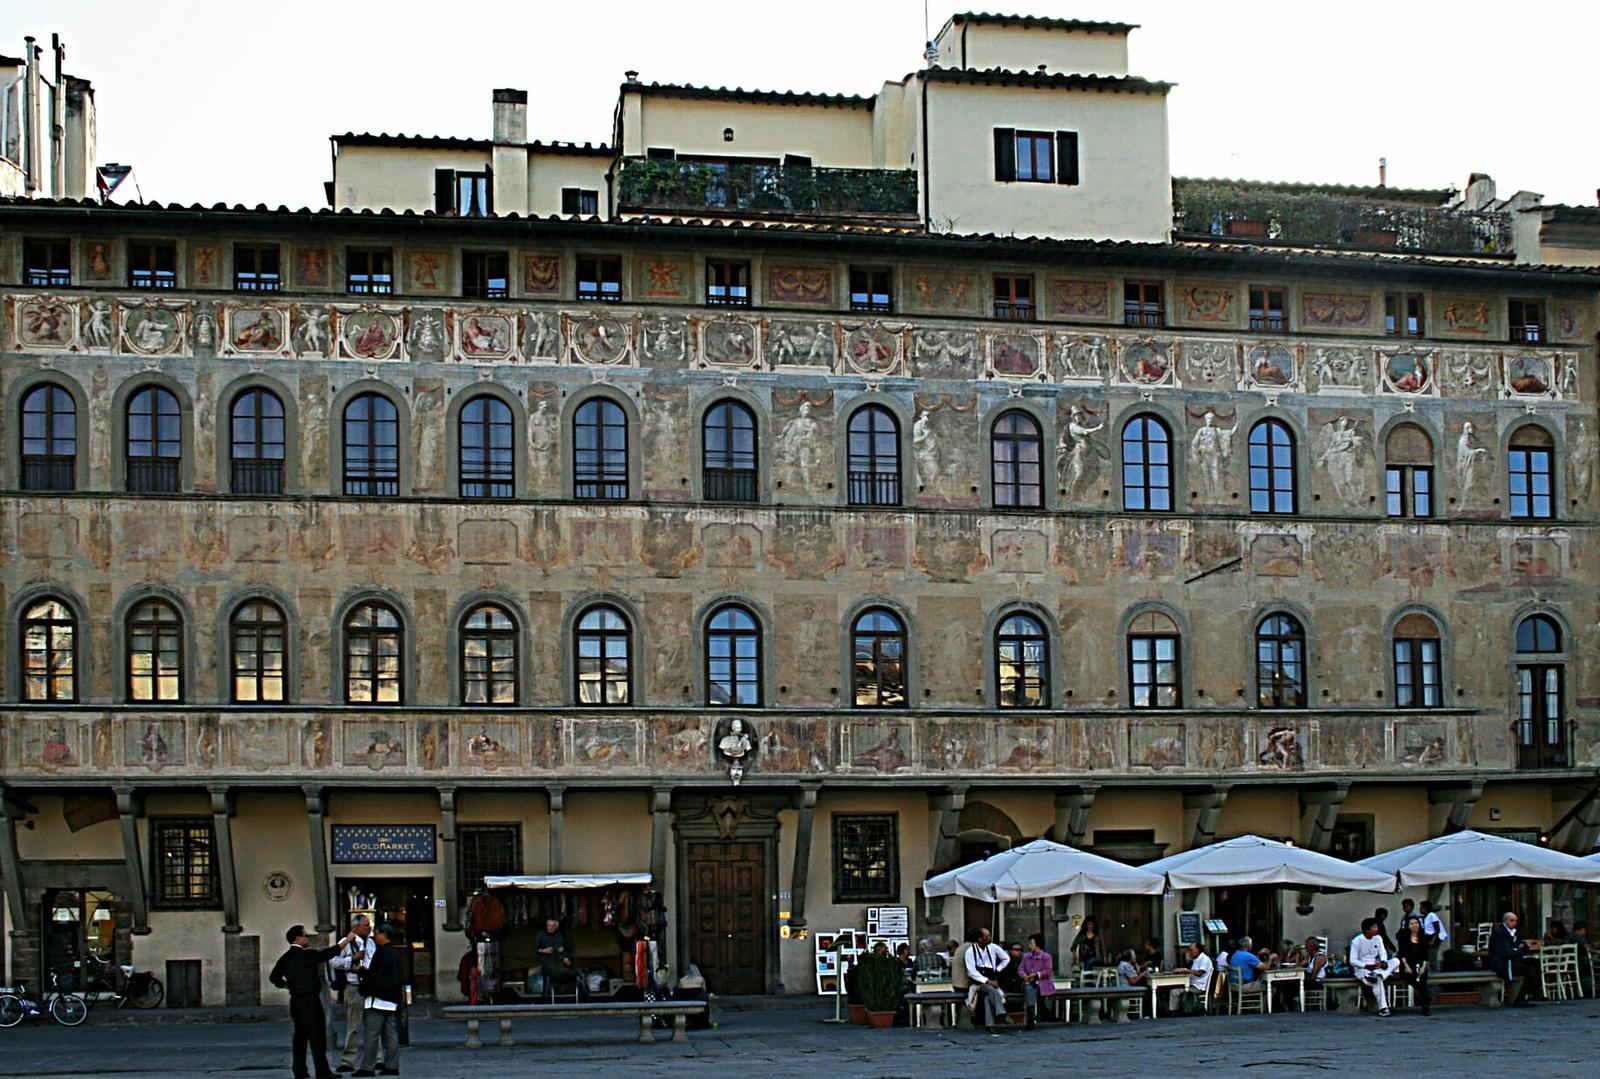 Firenzei teraszozók